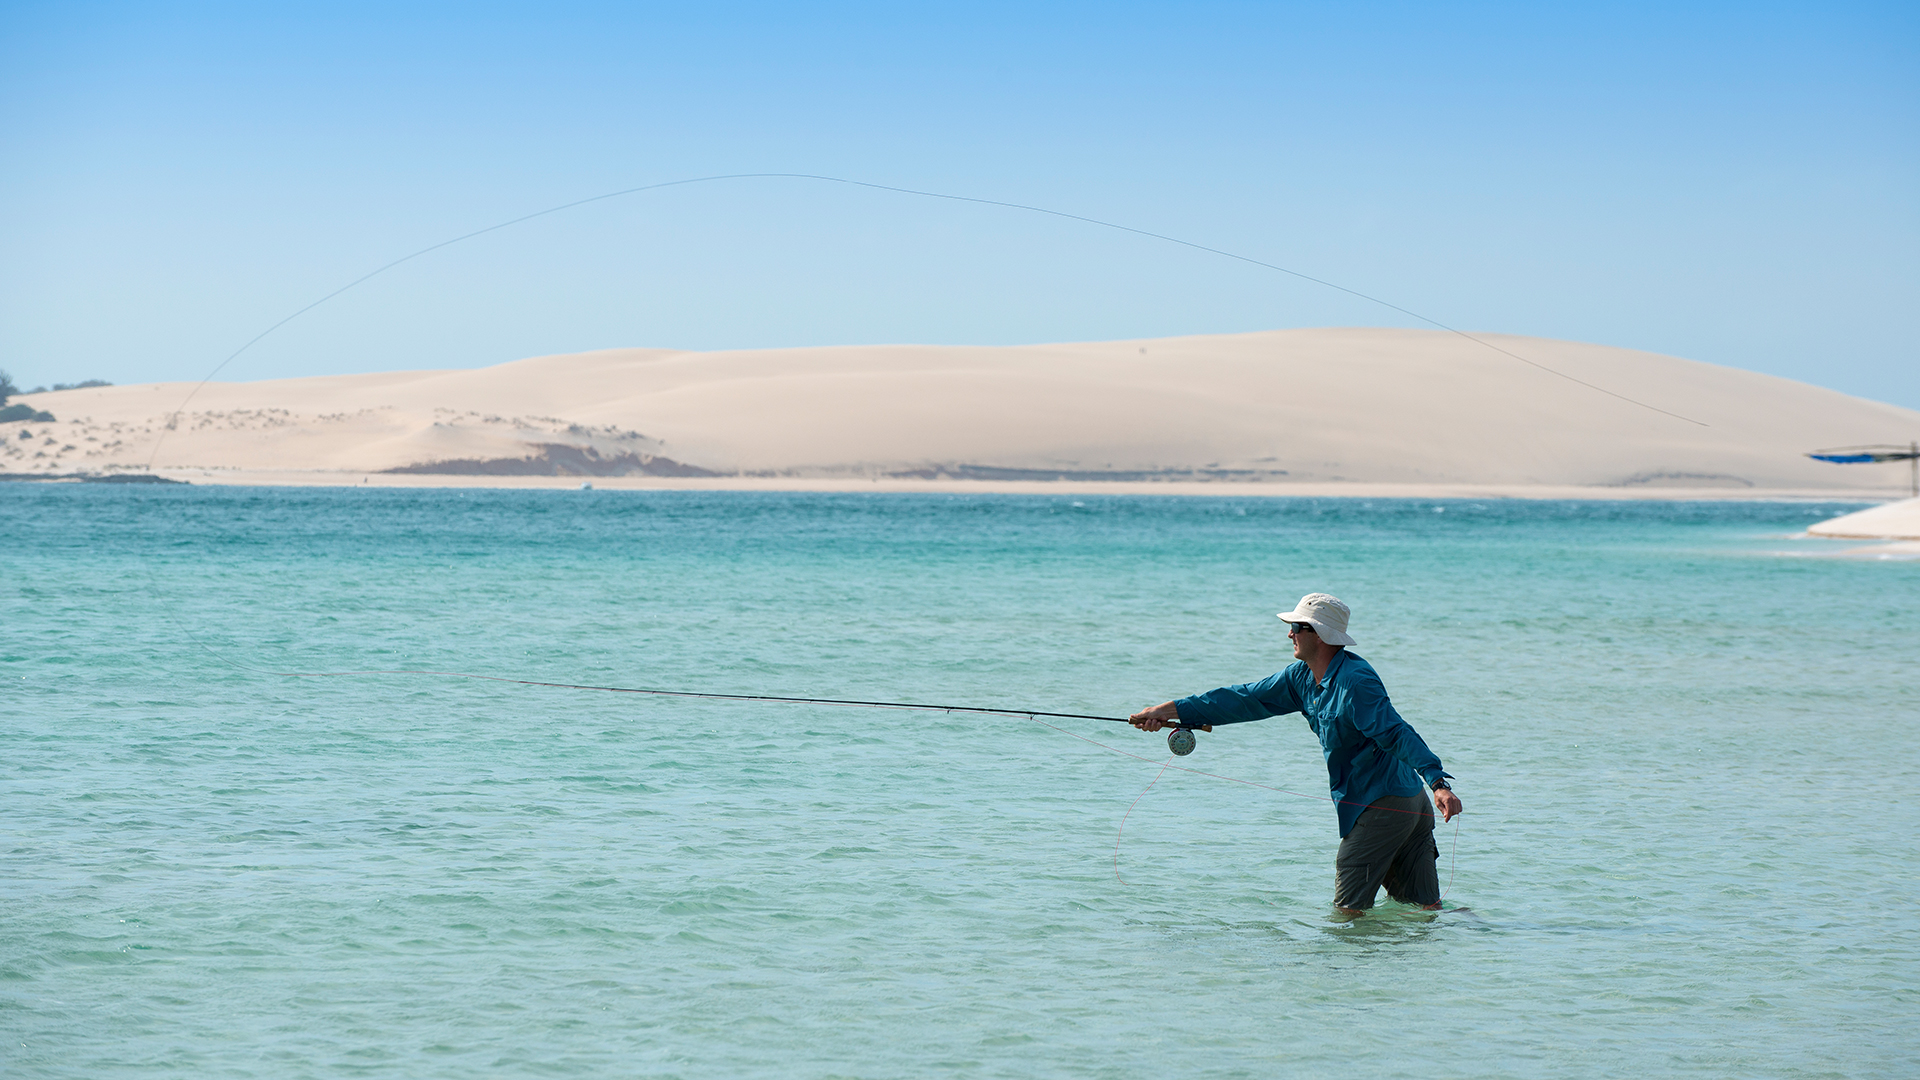 Bazaruto Archipelago is a world-renowned fishing destination